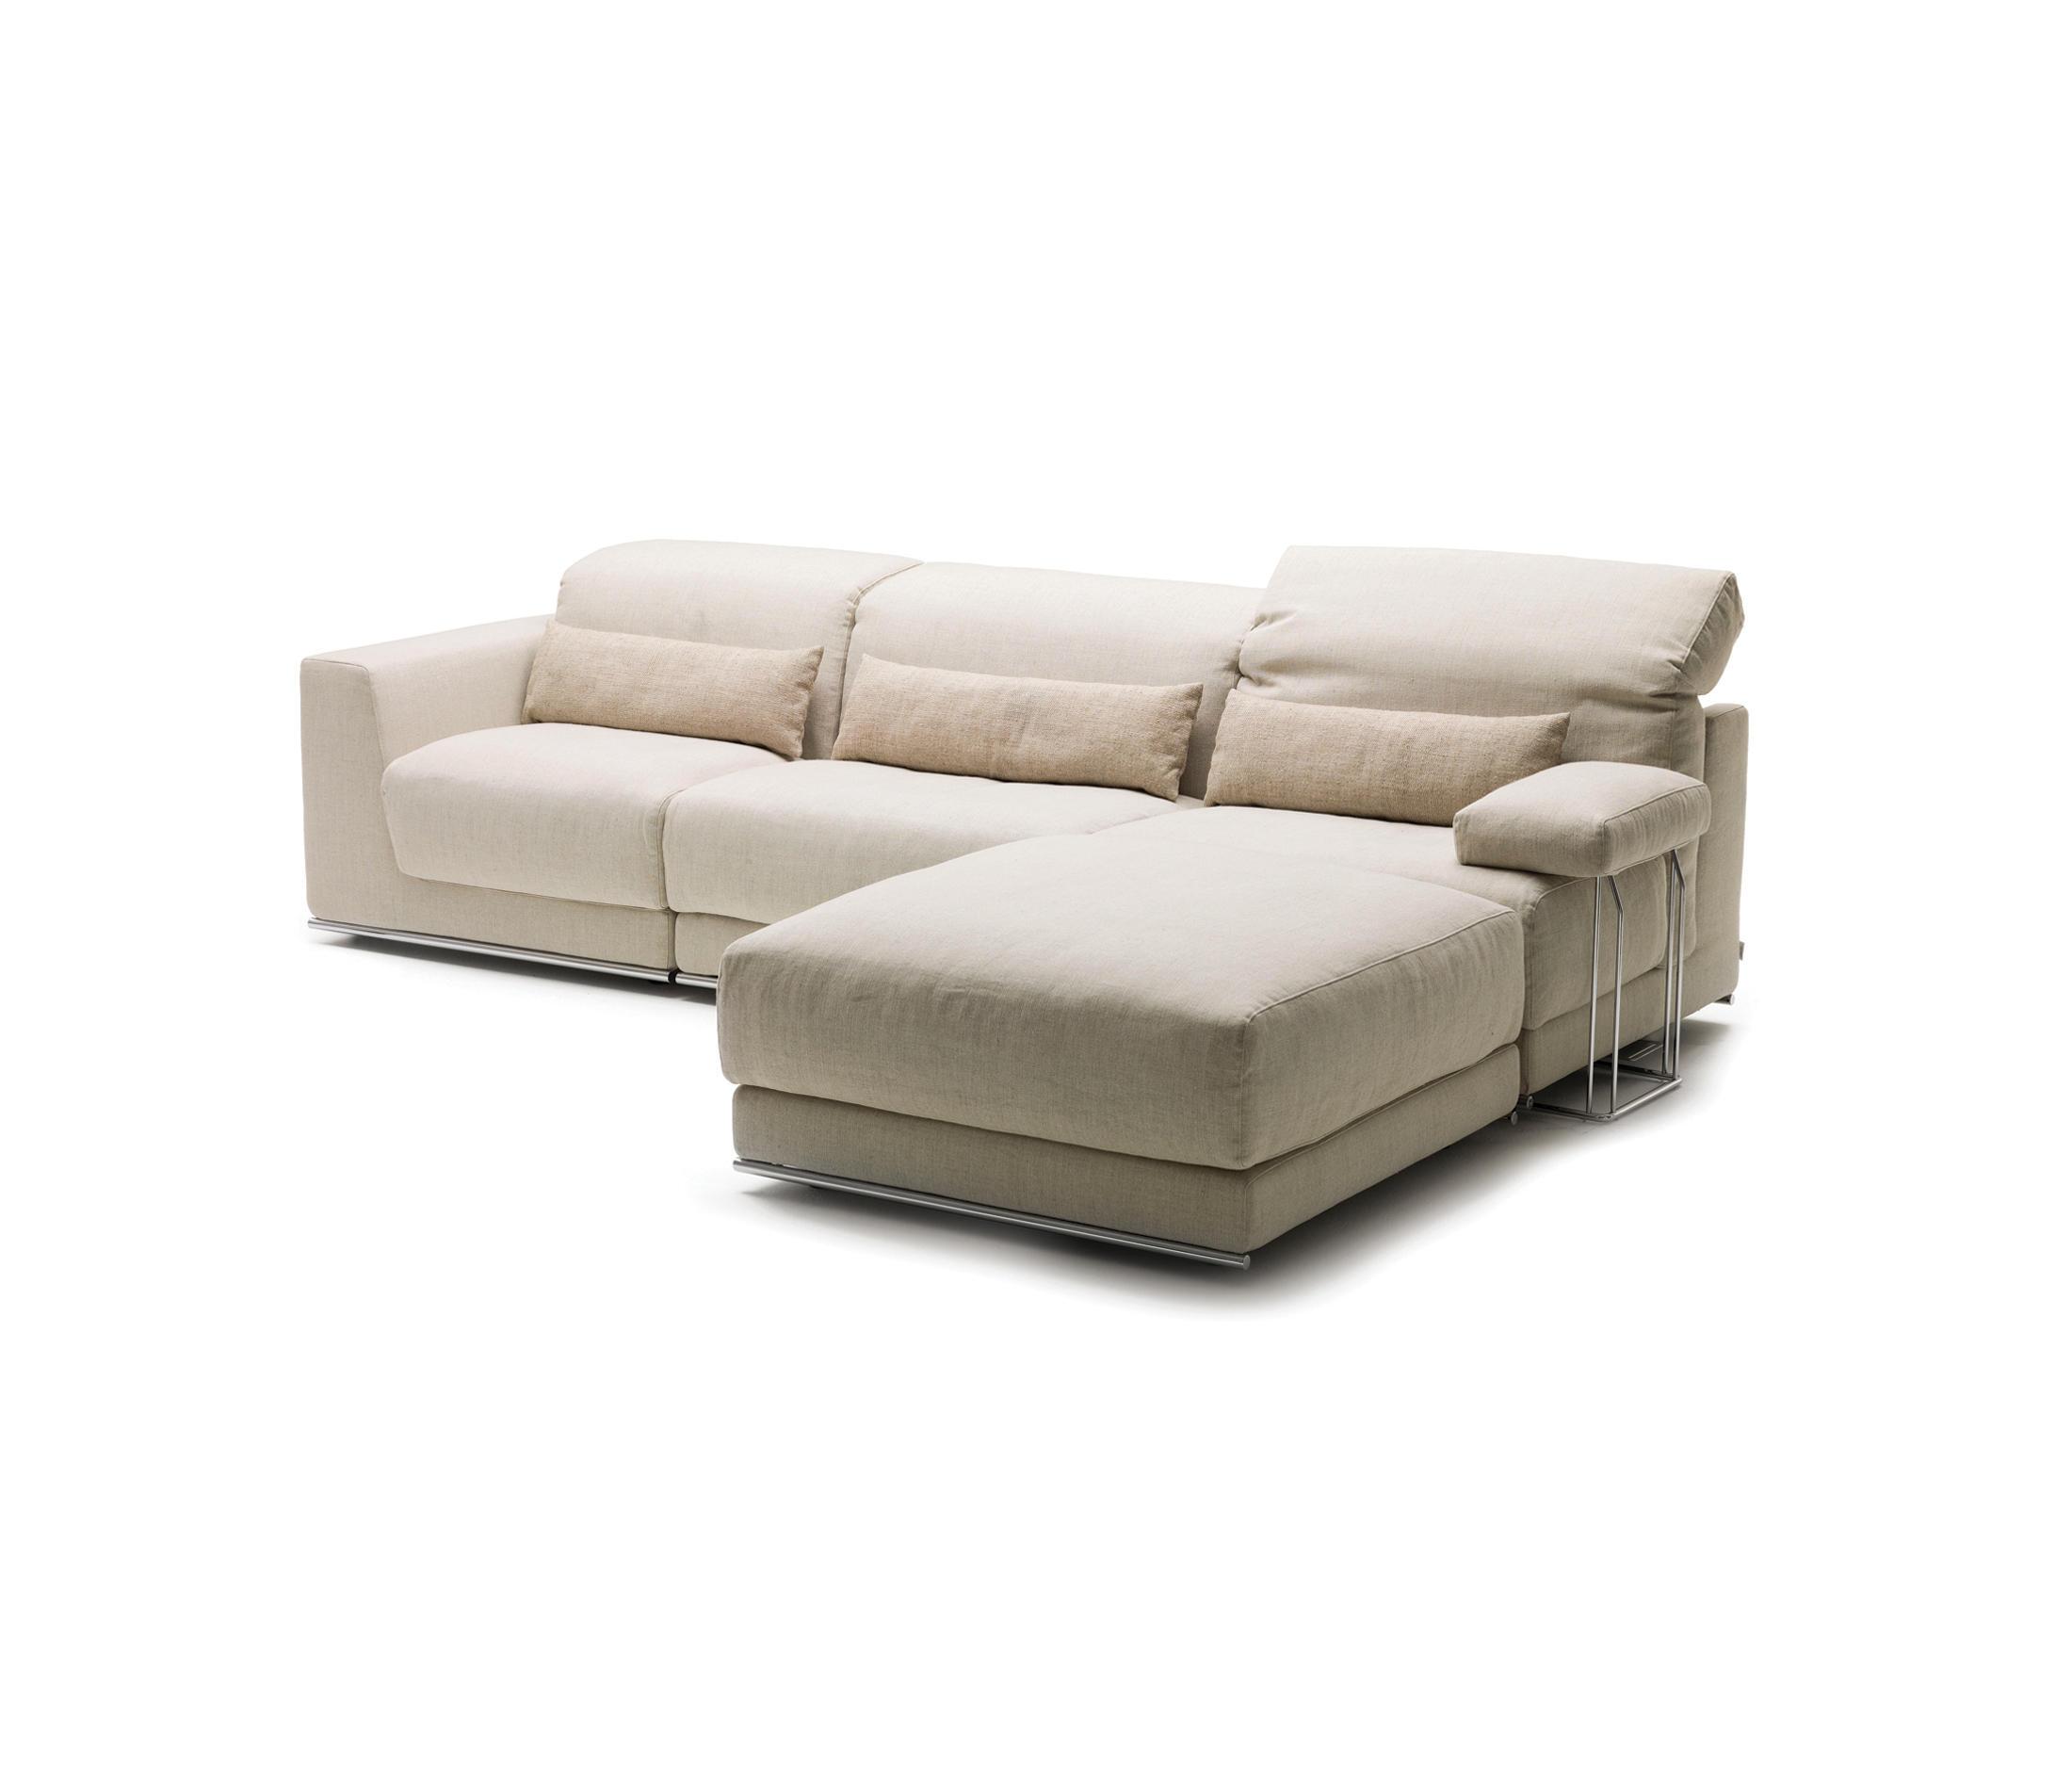 JOE Sofa beds from Milano Bedding